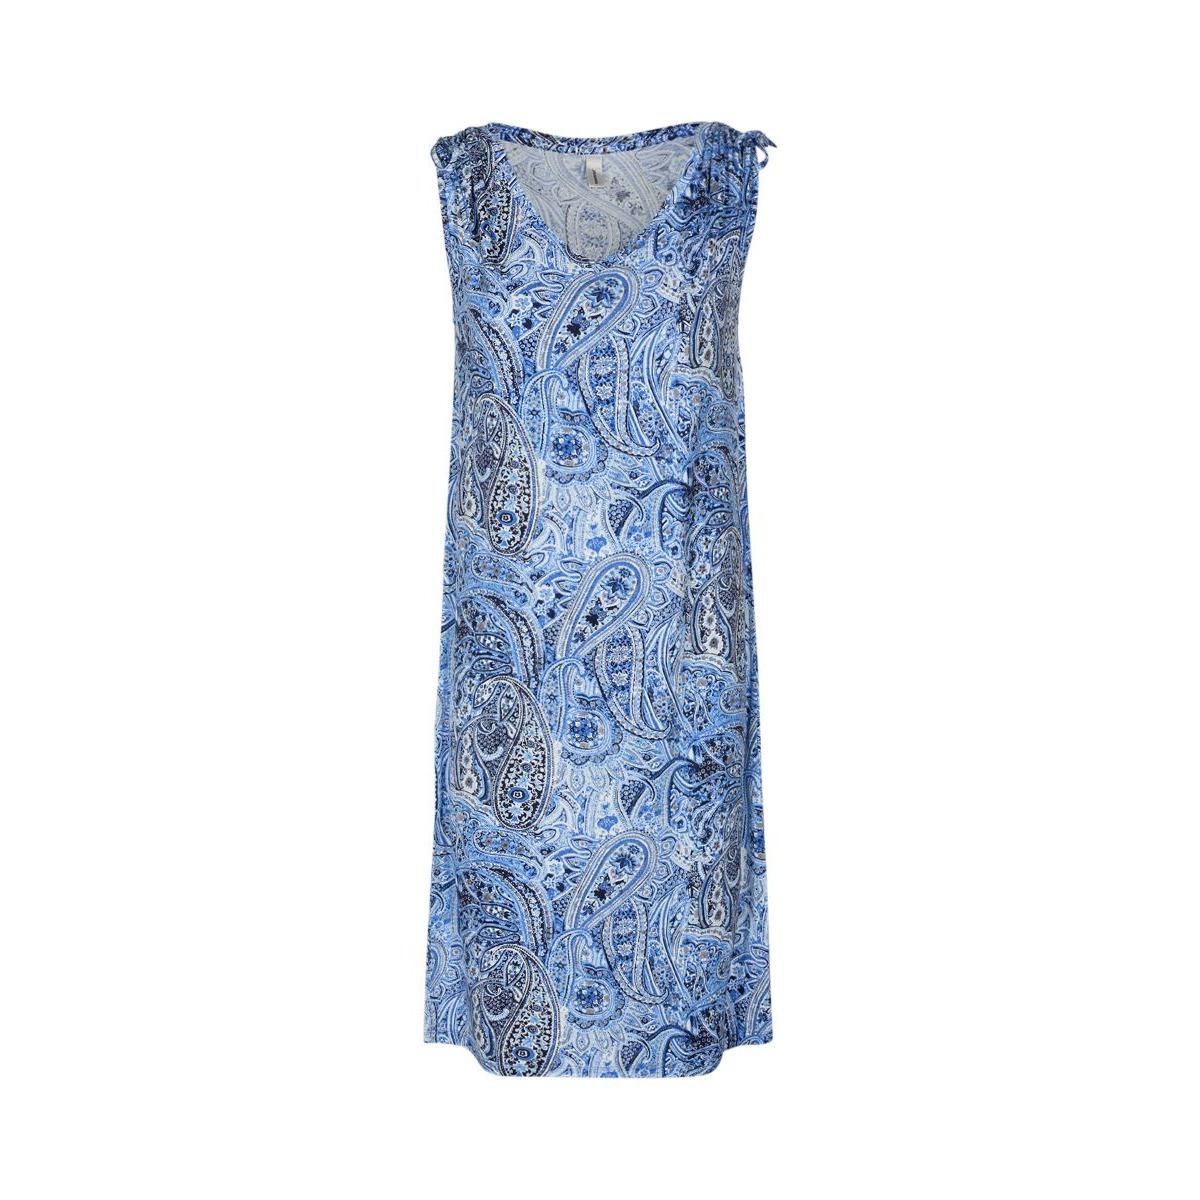 Dejlig blød og lækker lyocell-kjole Marica 97 fra Soyaconcept. Her i smuk blåt paisley-print